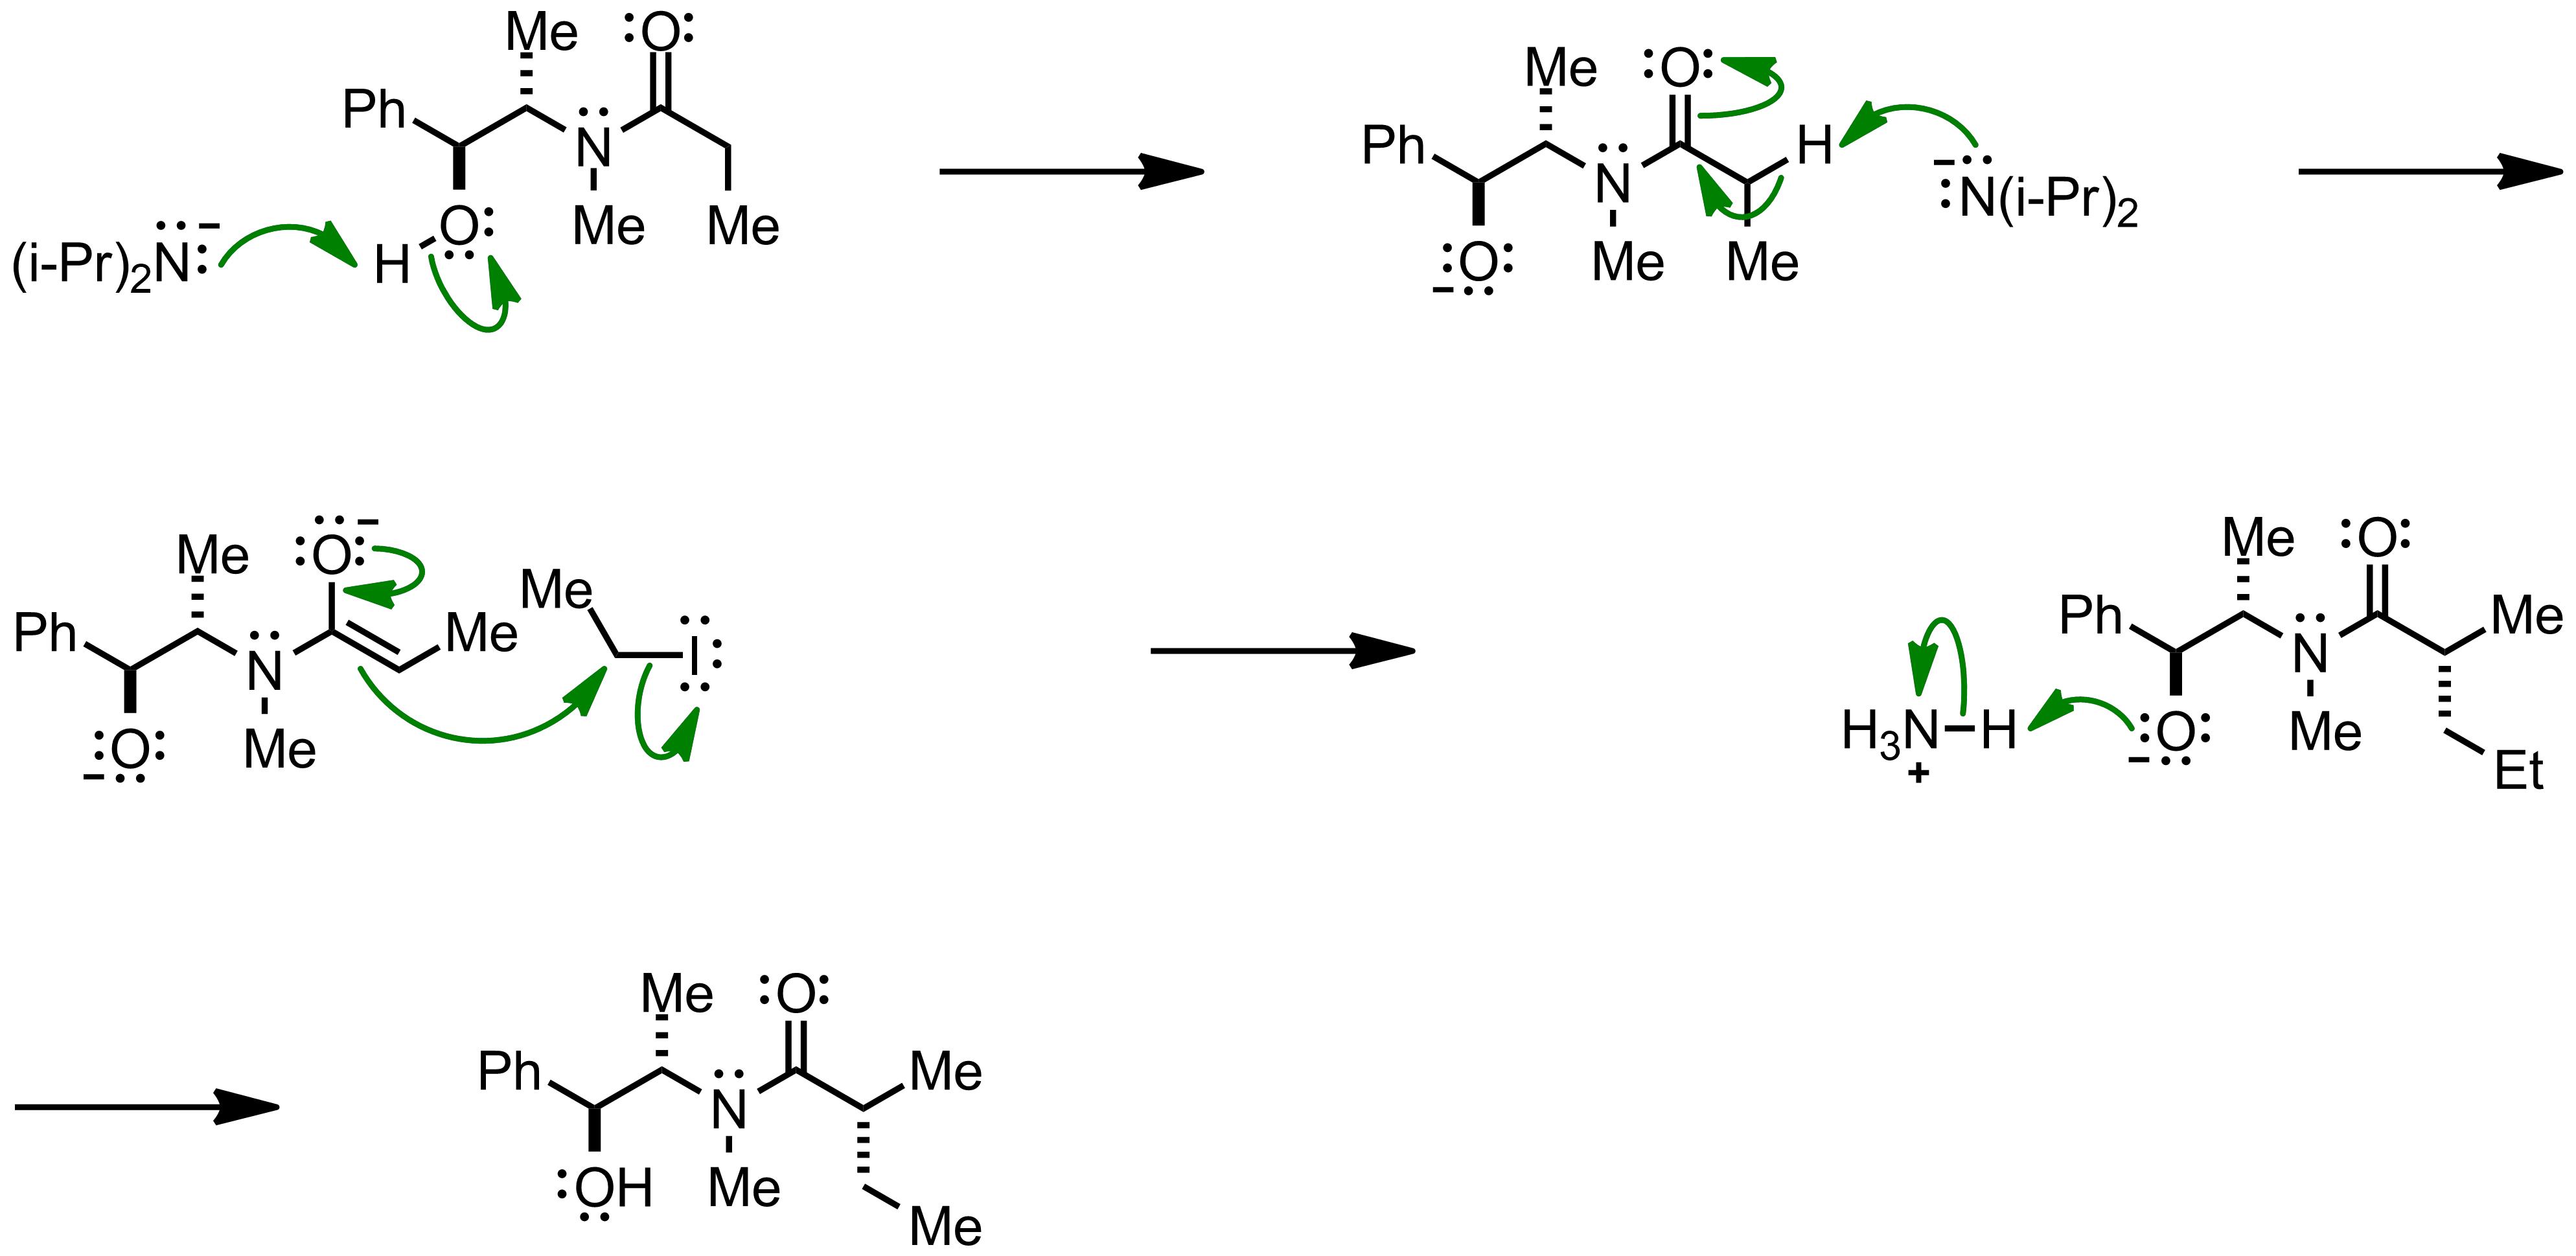 Mechanism of the Myers Asymmetric Alkylation